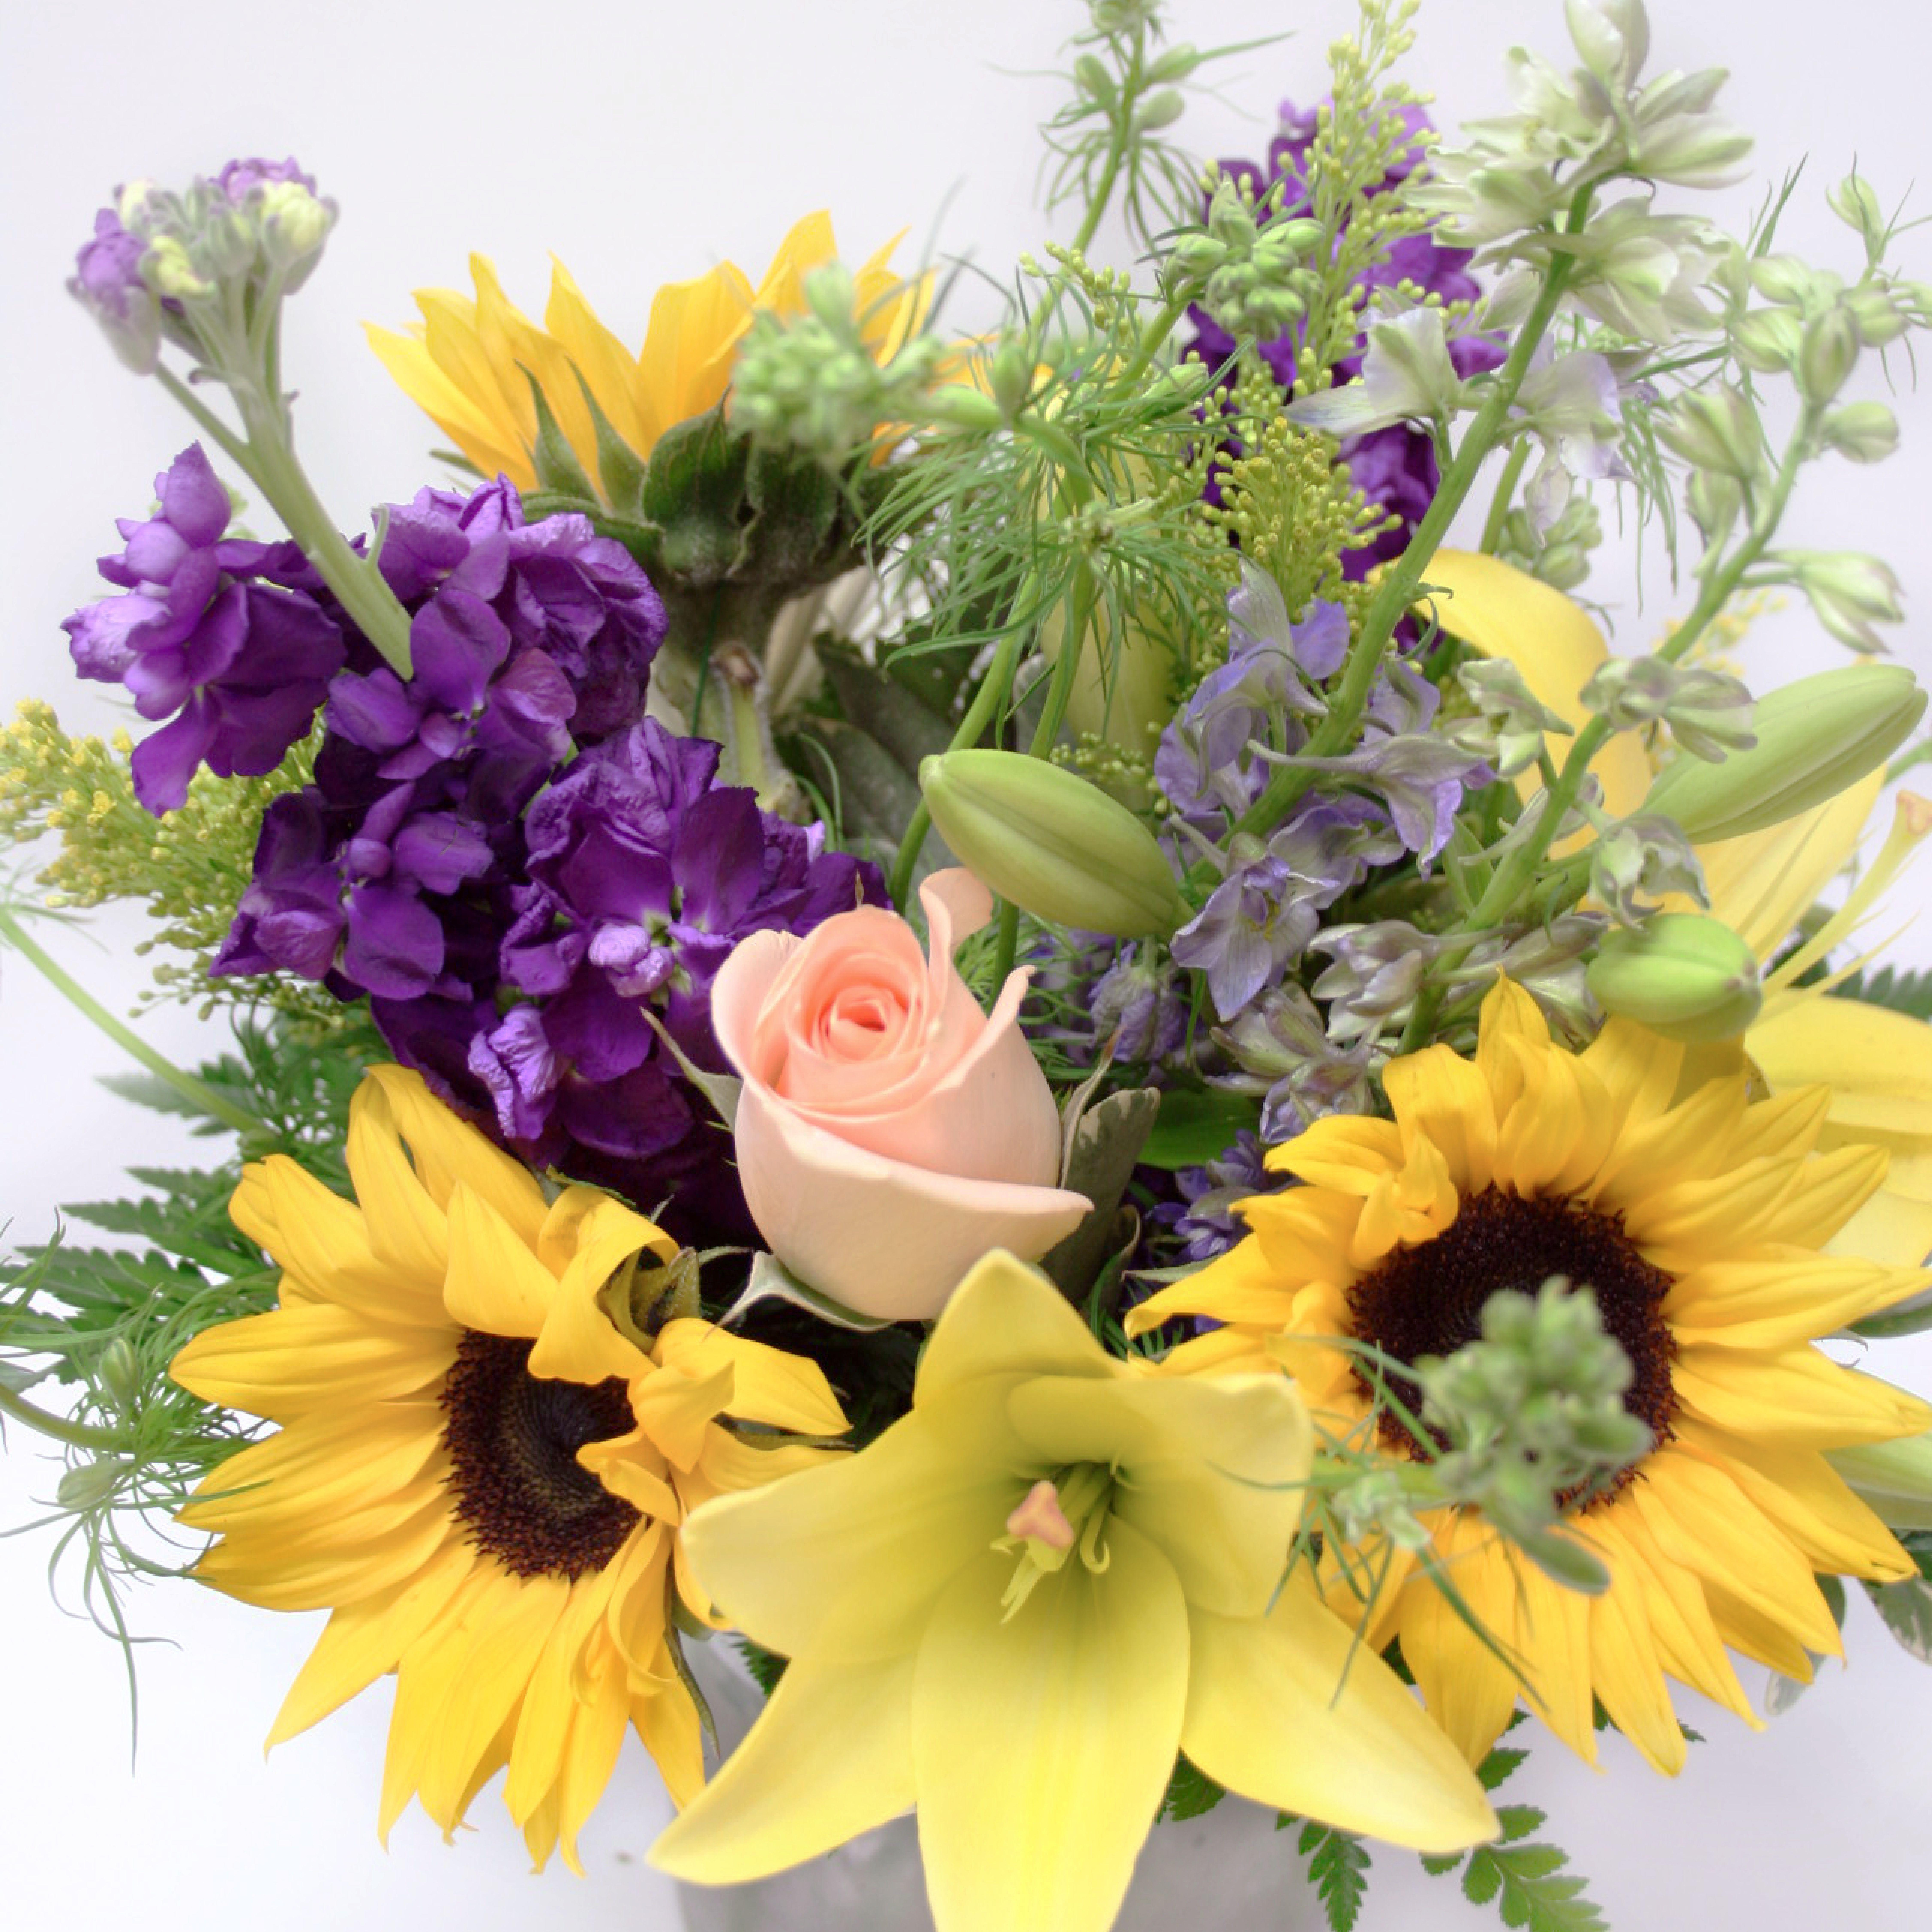 Freytags florist custom design flower arrangement with